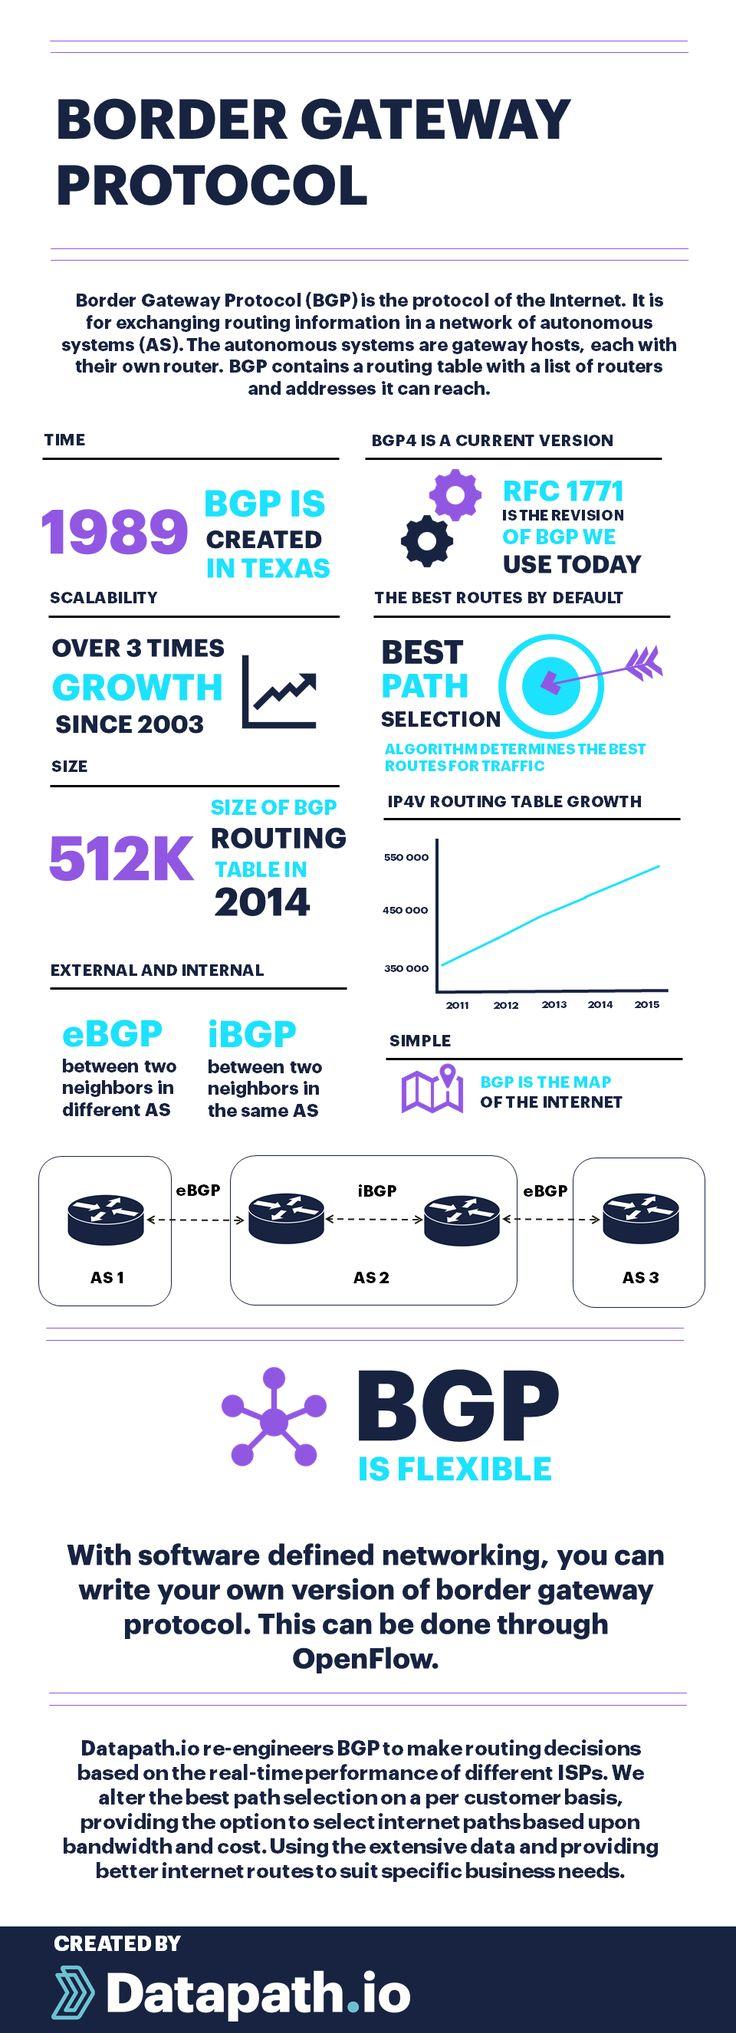 BGP Infographic: Border Gateway Protocol